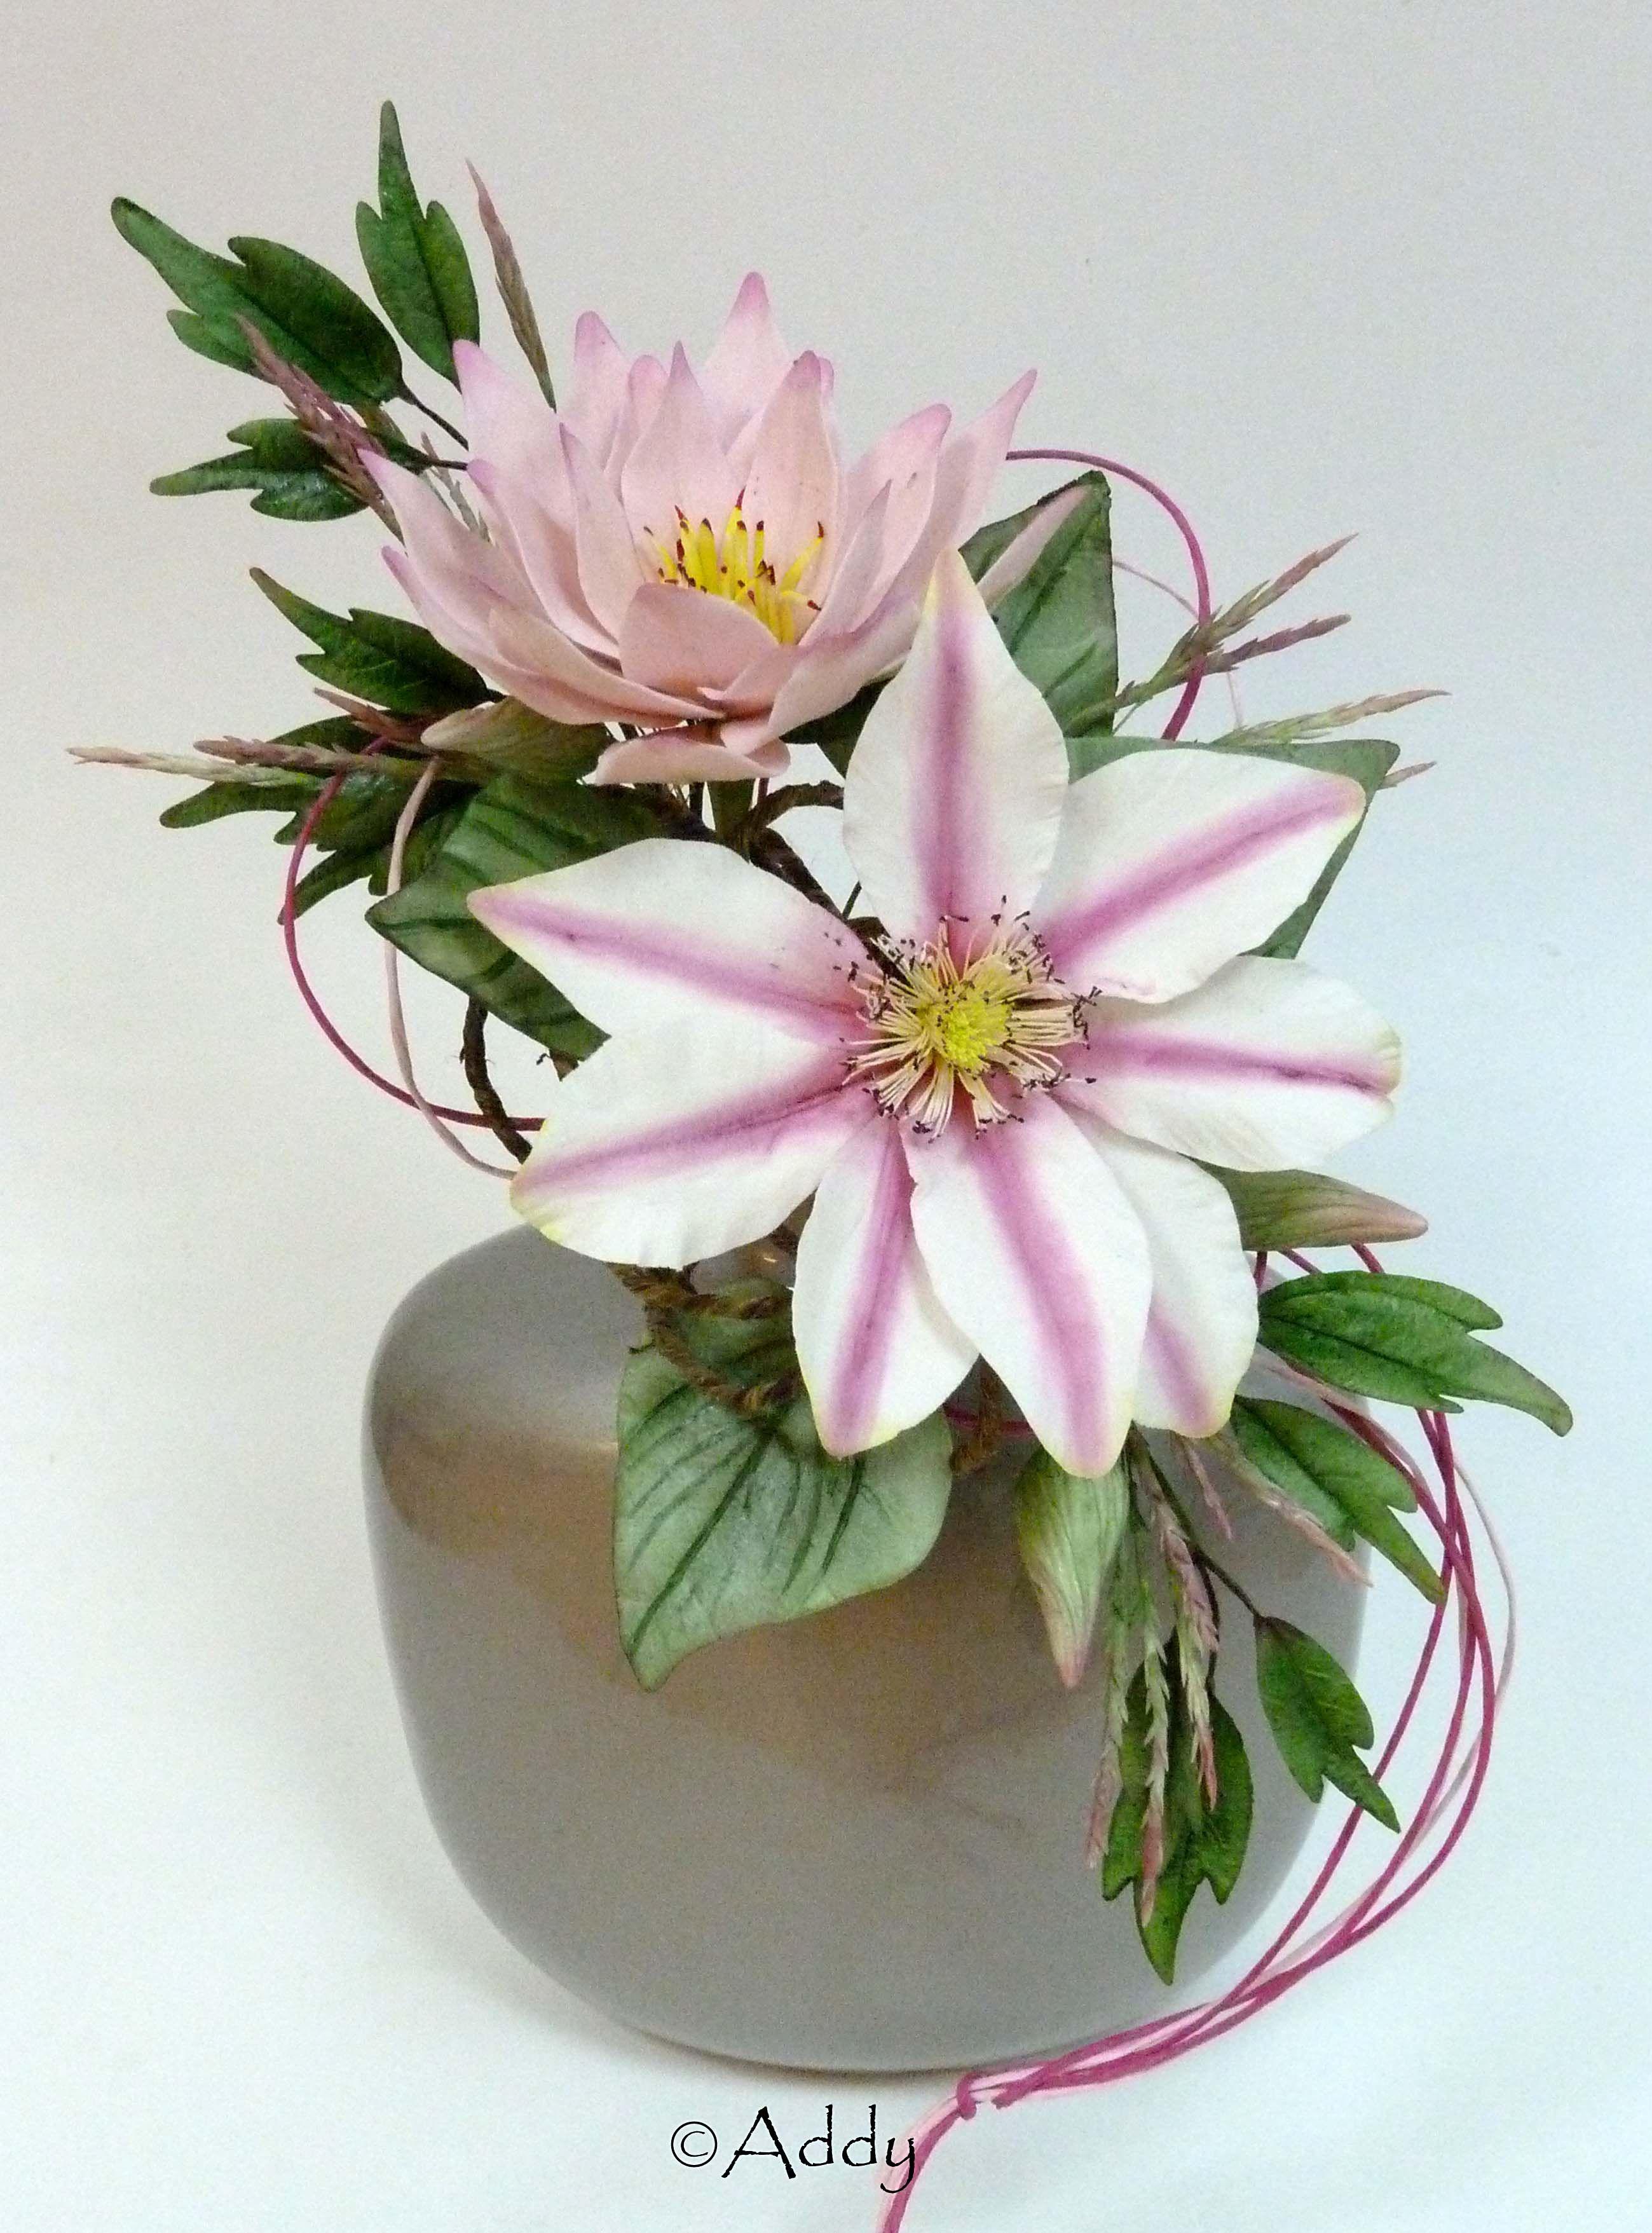 Clematis water lily masterclass alan dunn gumpaste flowers clematis water lily masterclass alan dunn izmirmasajfo